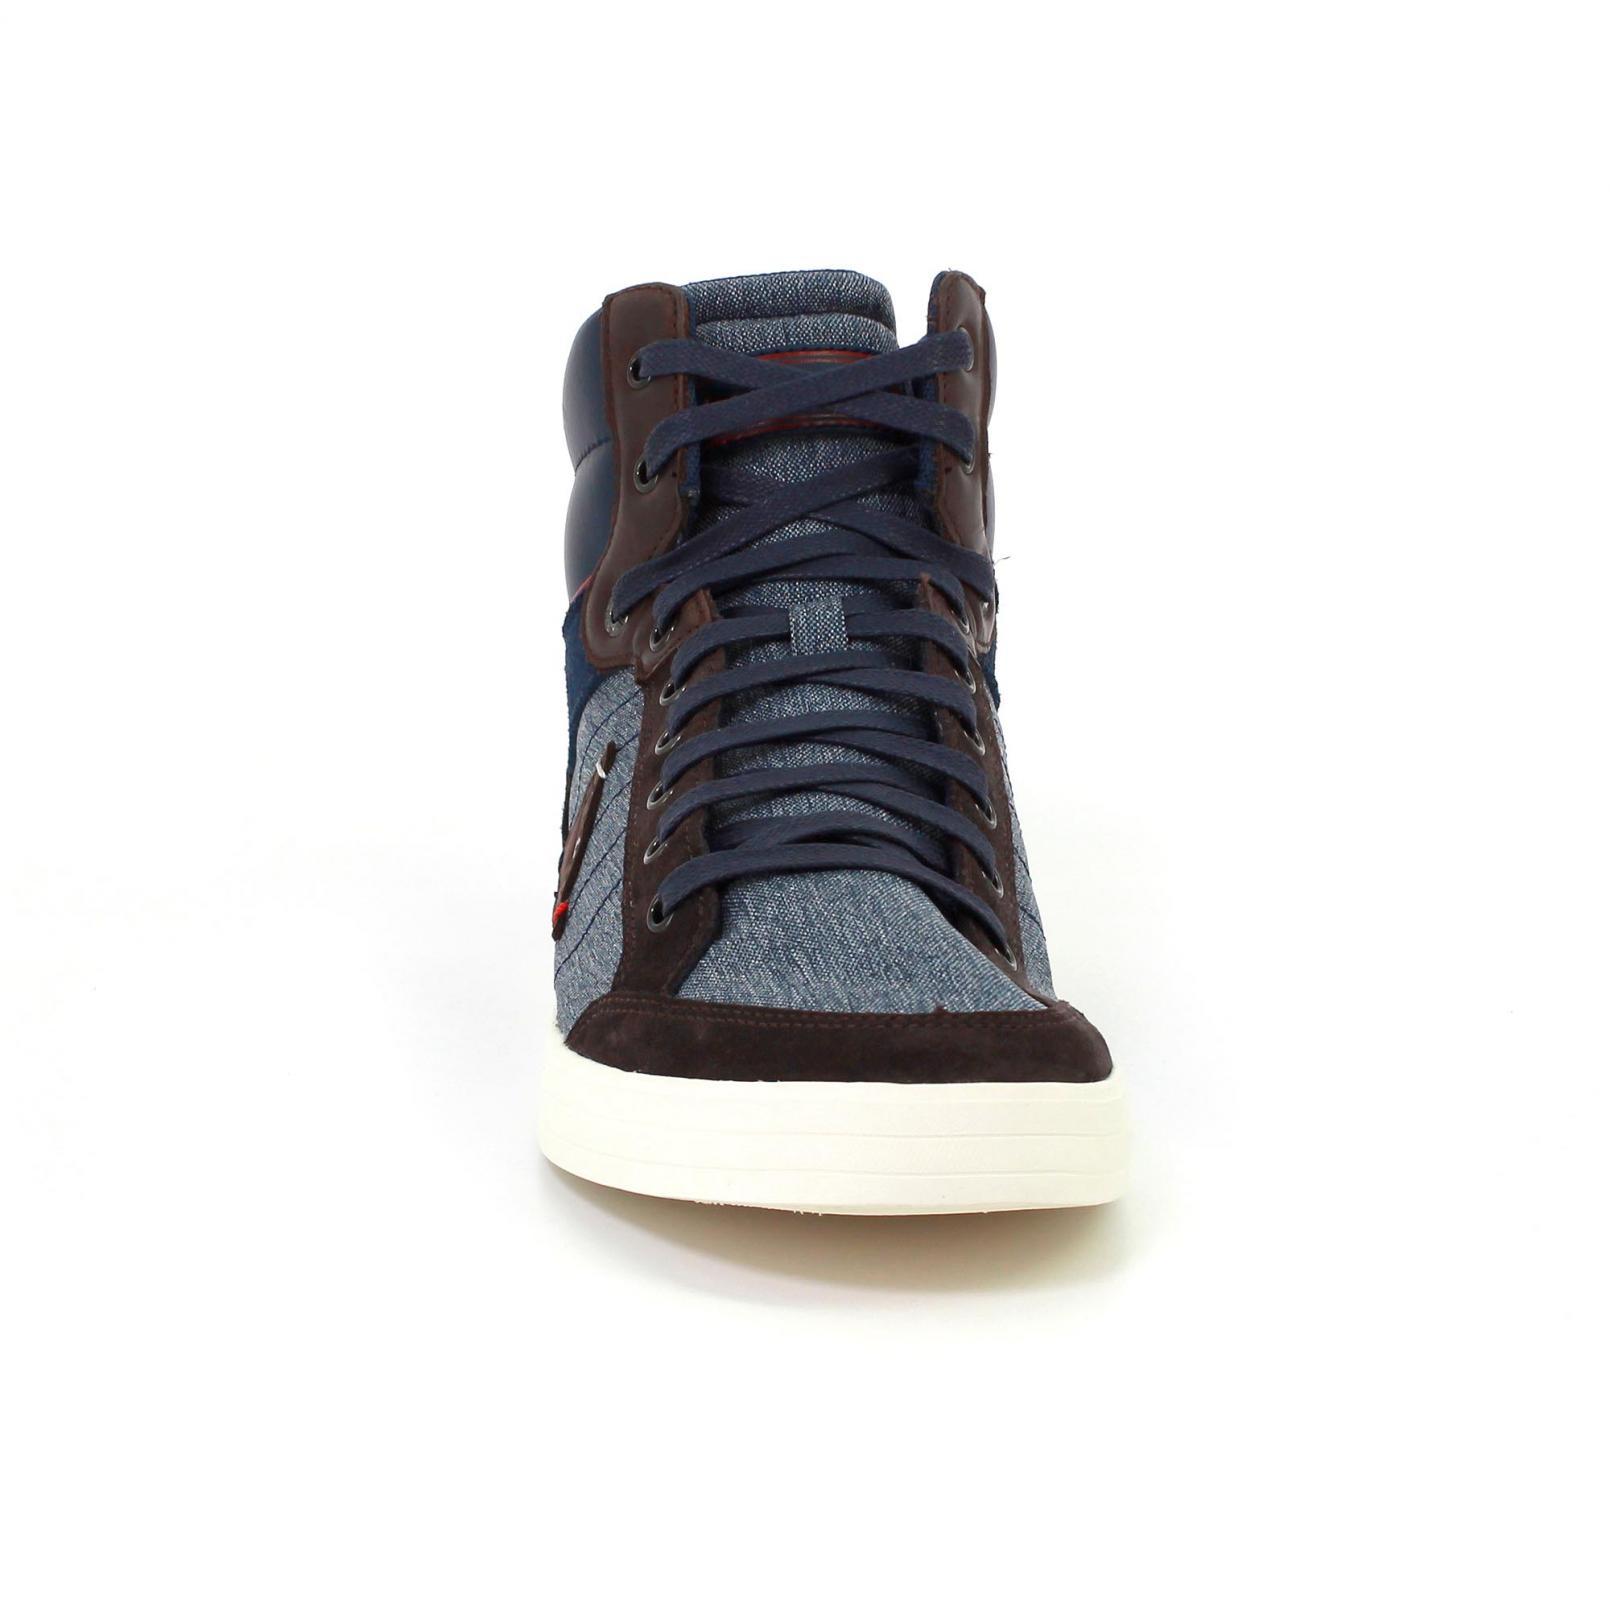 Shoes – Le Coq Sportif Portalet Mid Craft 2 Tones Blue/Brown